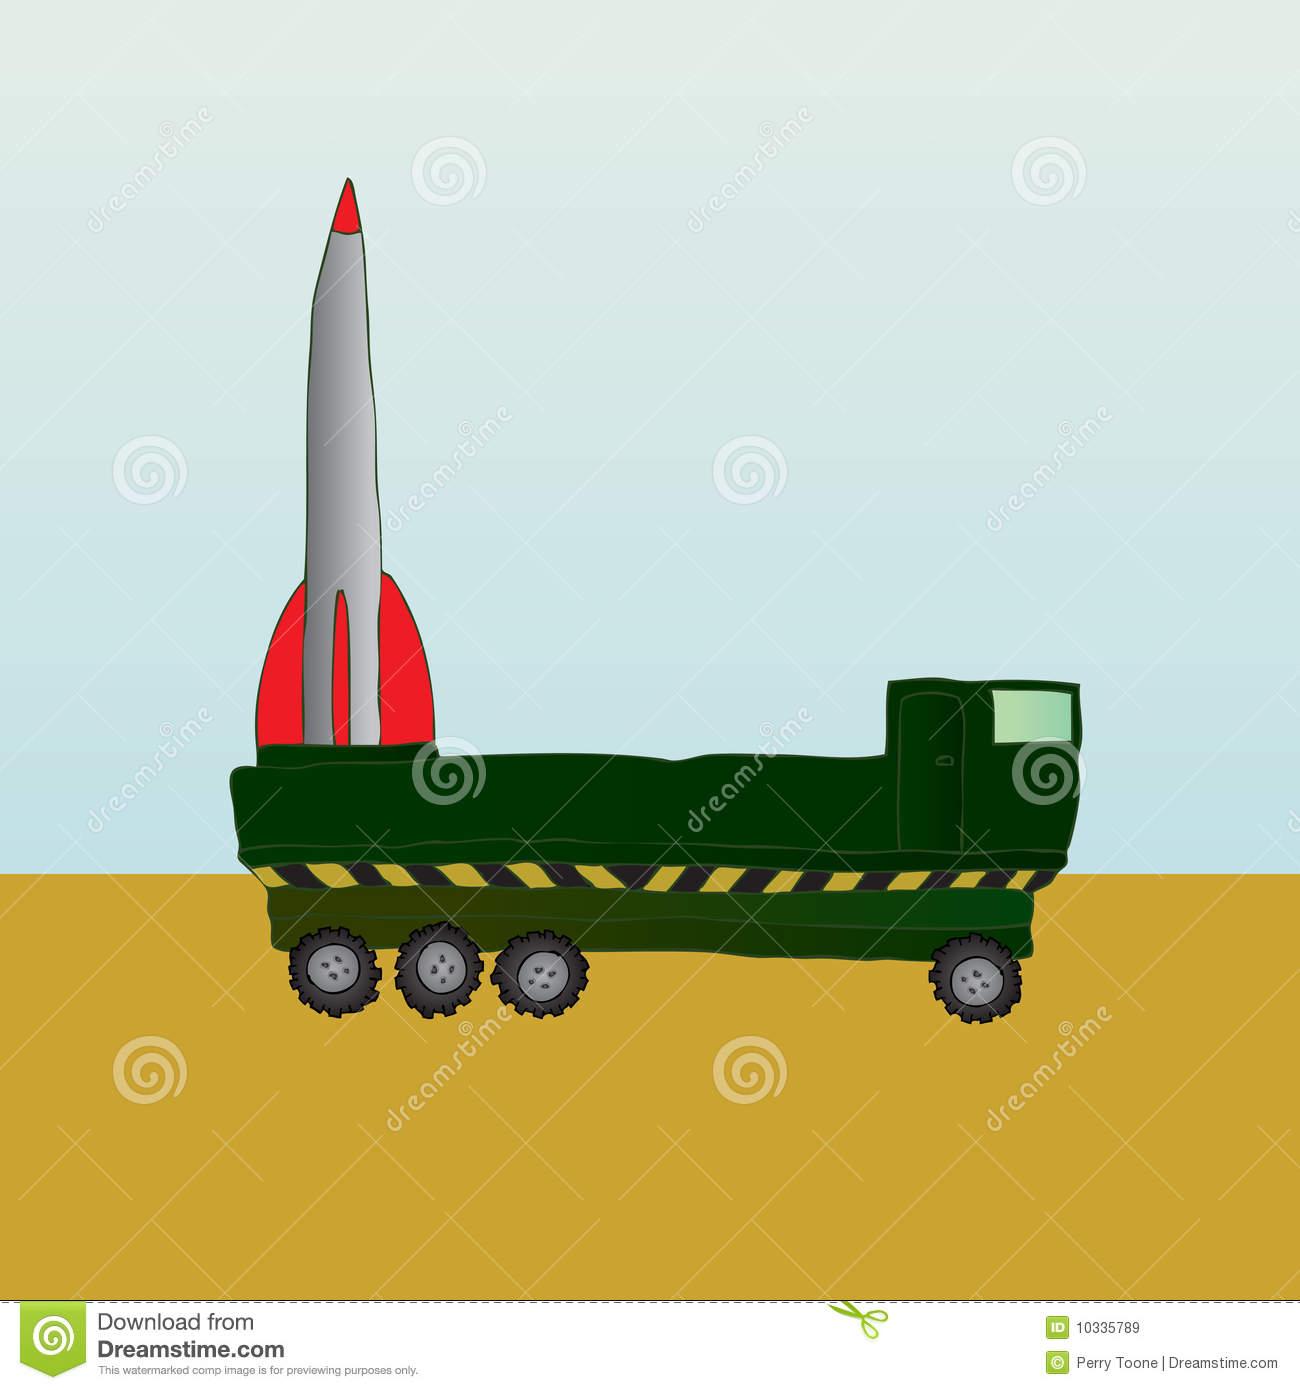 V2 Rocket Royalty Free Stock Images.